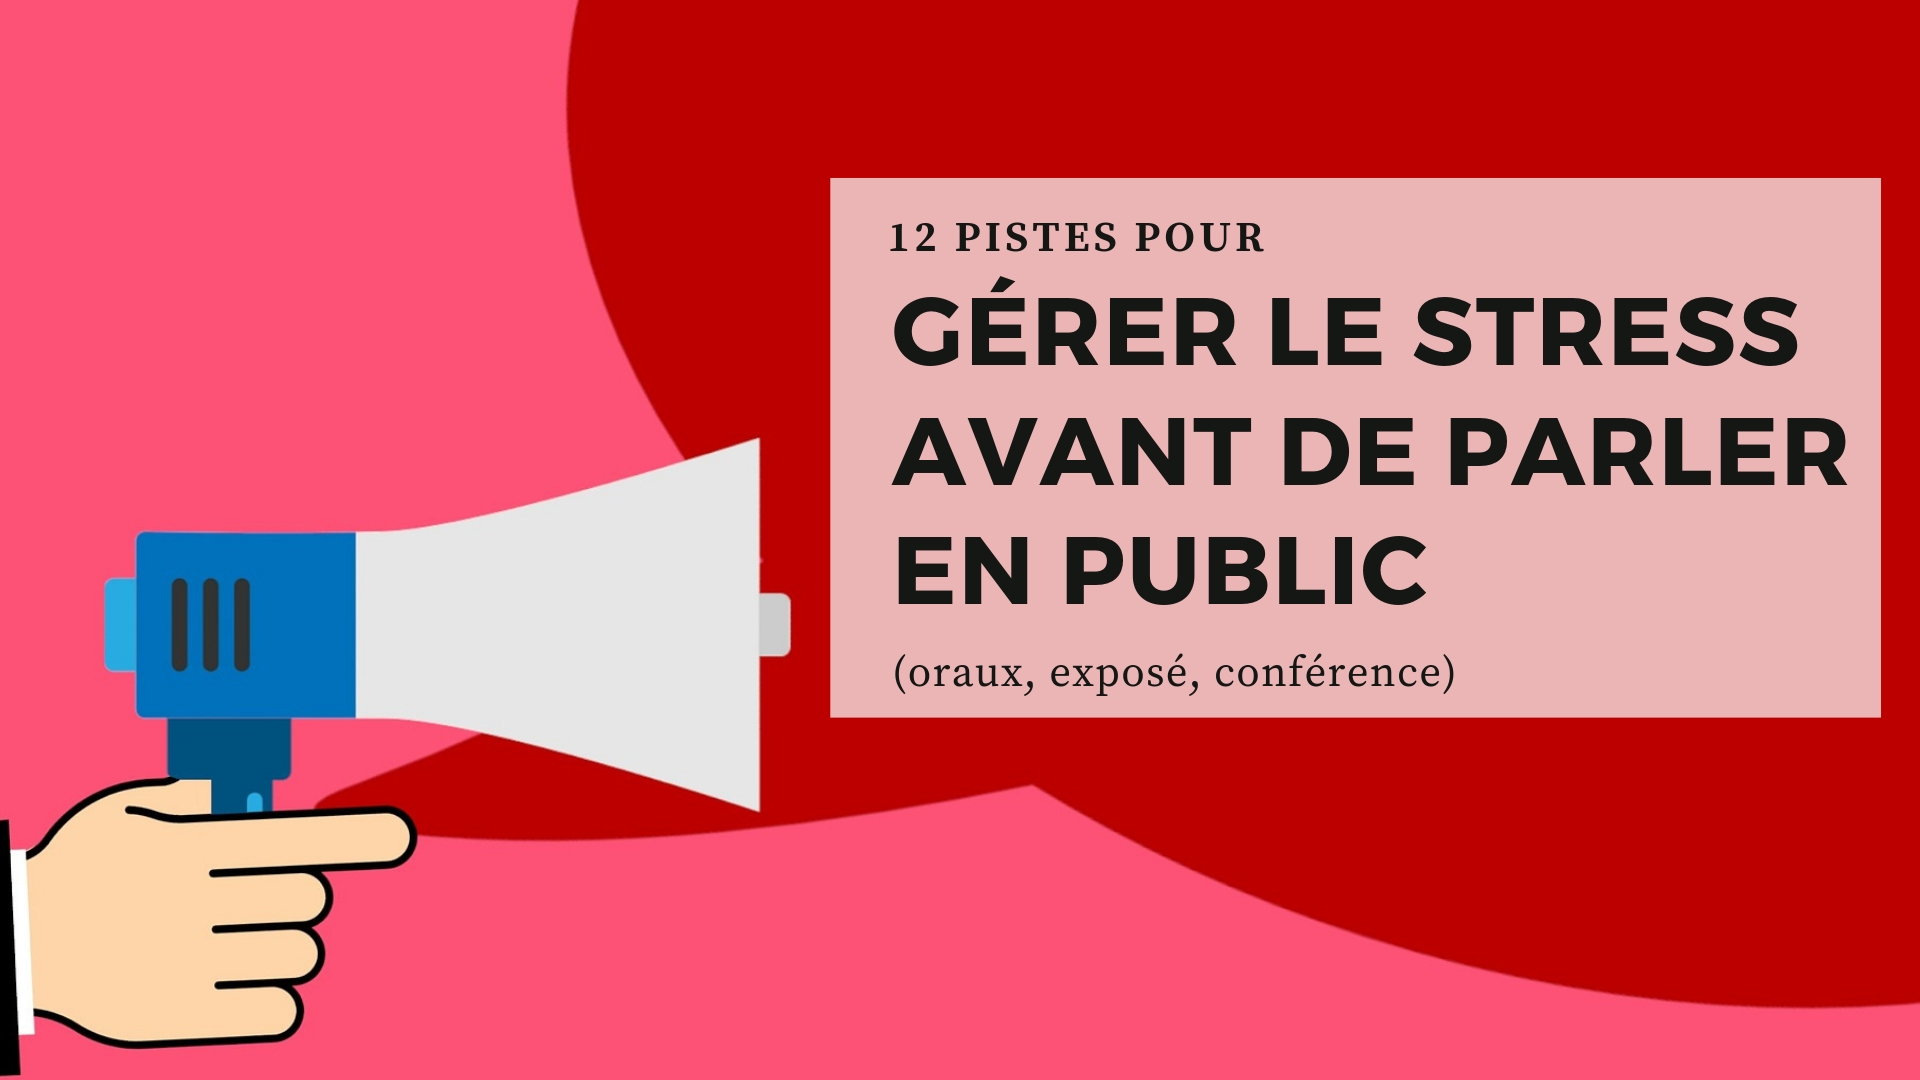 gérer stress parler en public